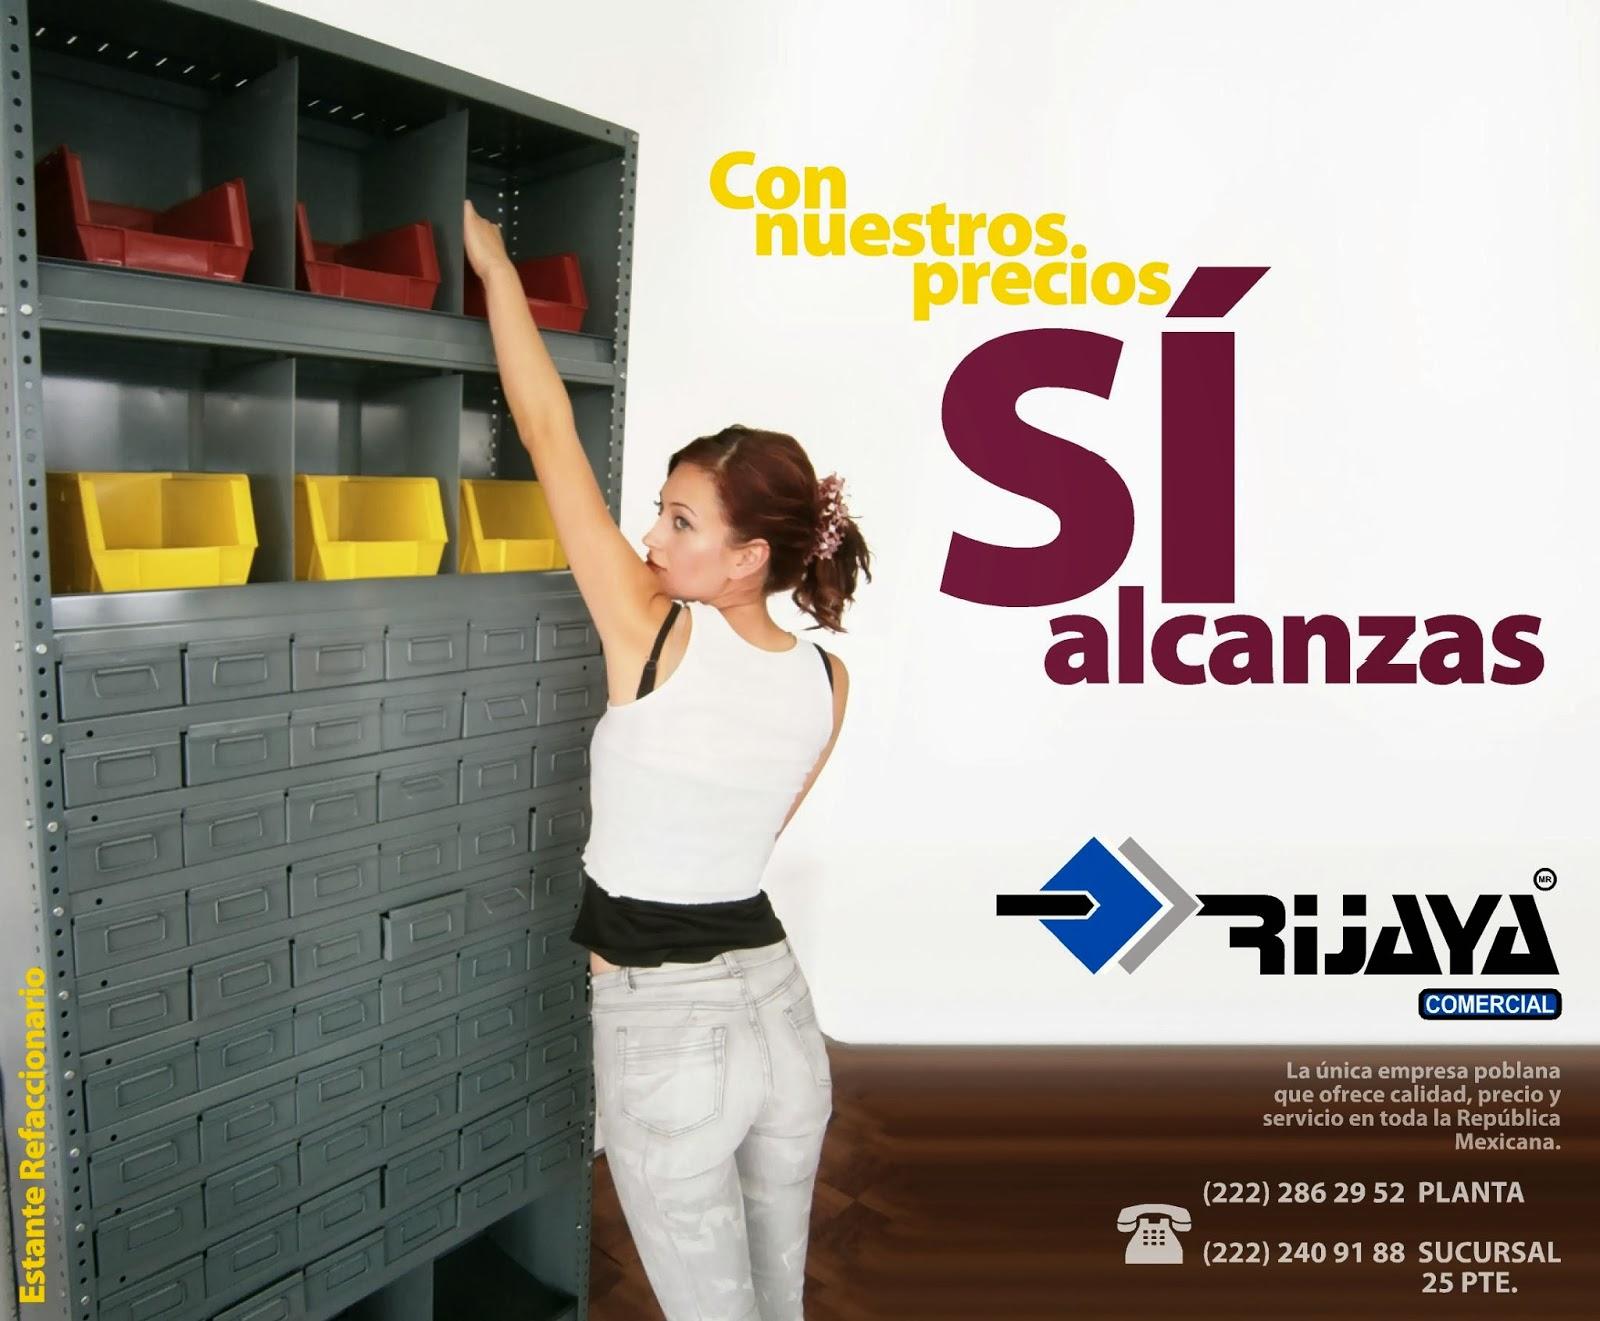 Muebles Rijaya Puebla - Rijaya Comercial Febrero 2014[mjhdah]http://4.bp.blogspot.com/-SzBpndS7OPU/UoTxmzCXKvI/AAAAAAAACRg/fsbA2vJJZmc/s1600/FLYER+EVENTO.jpg